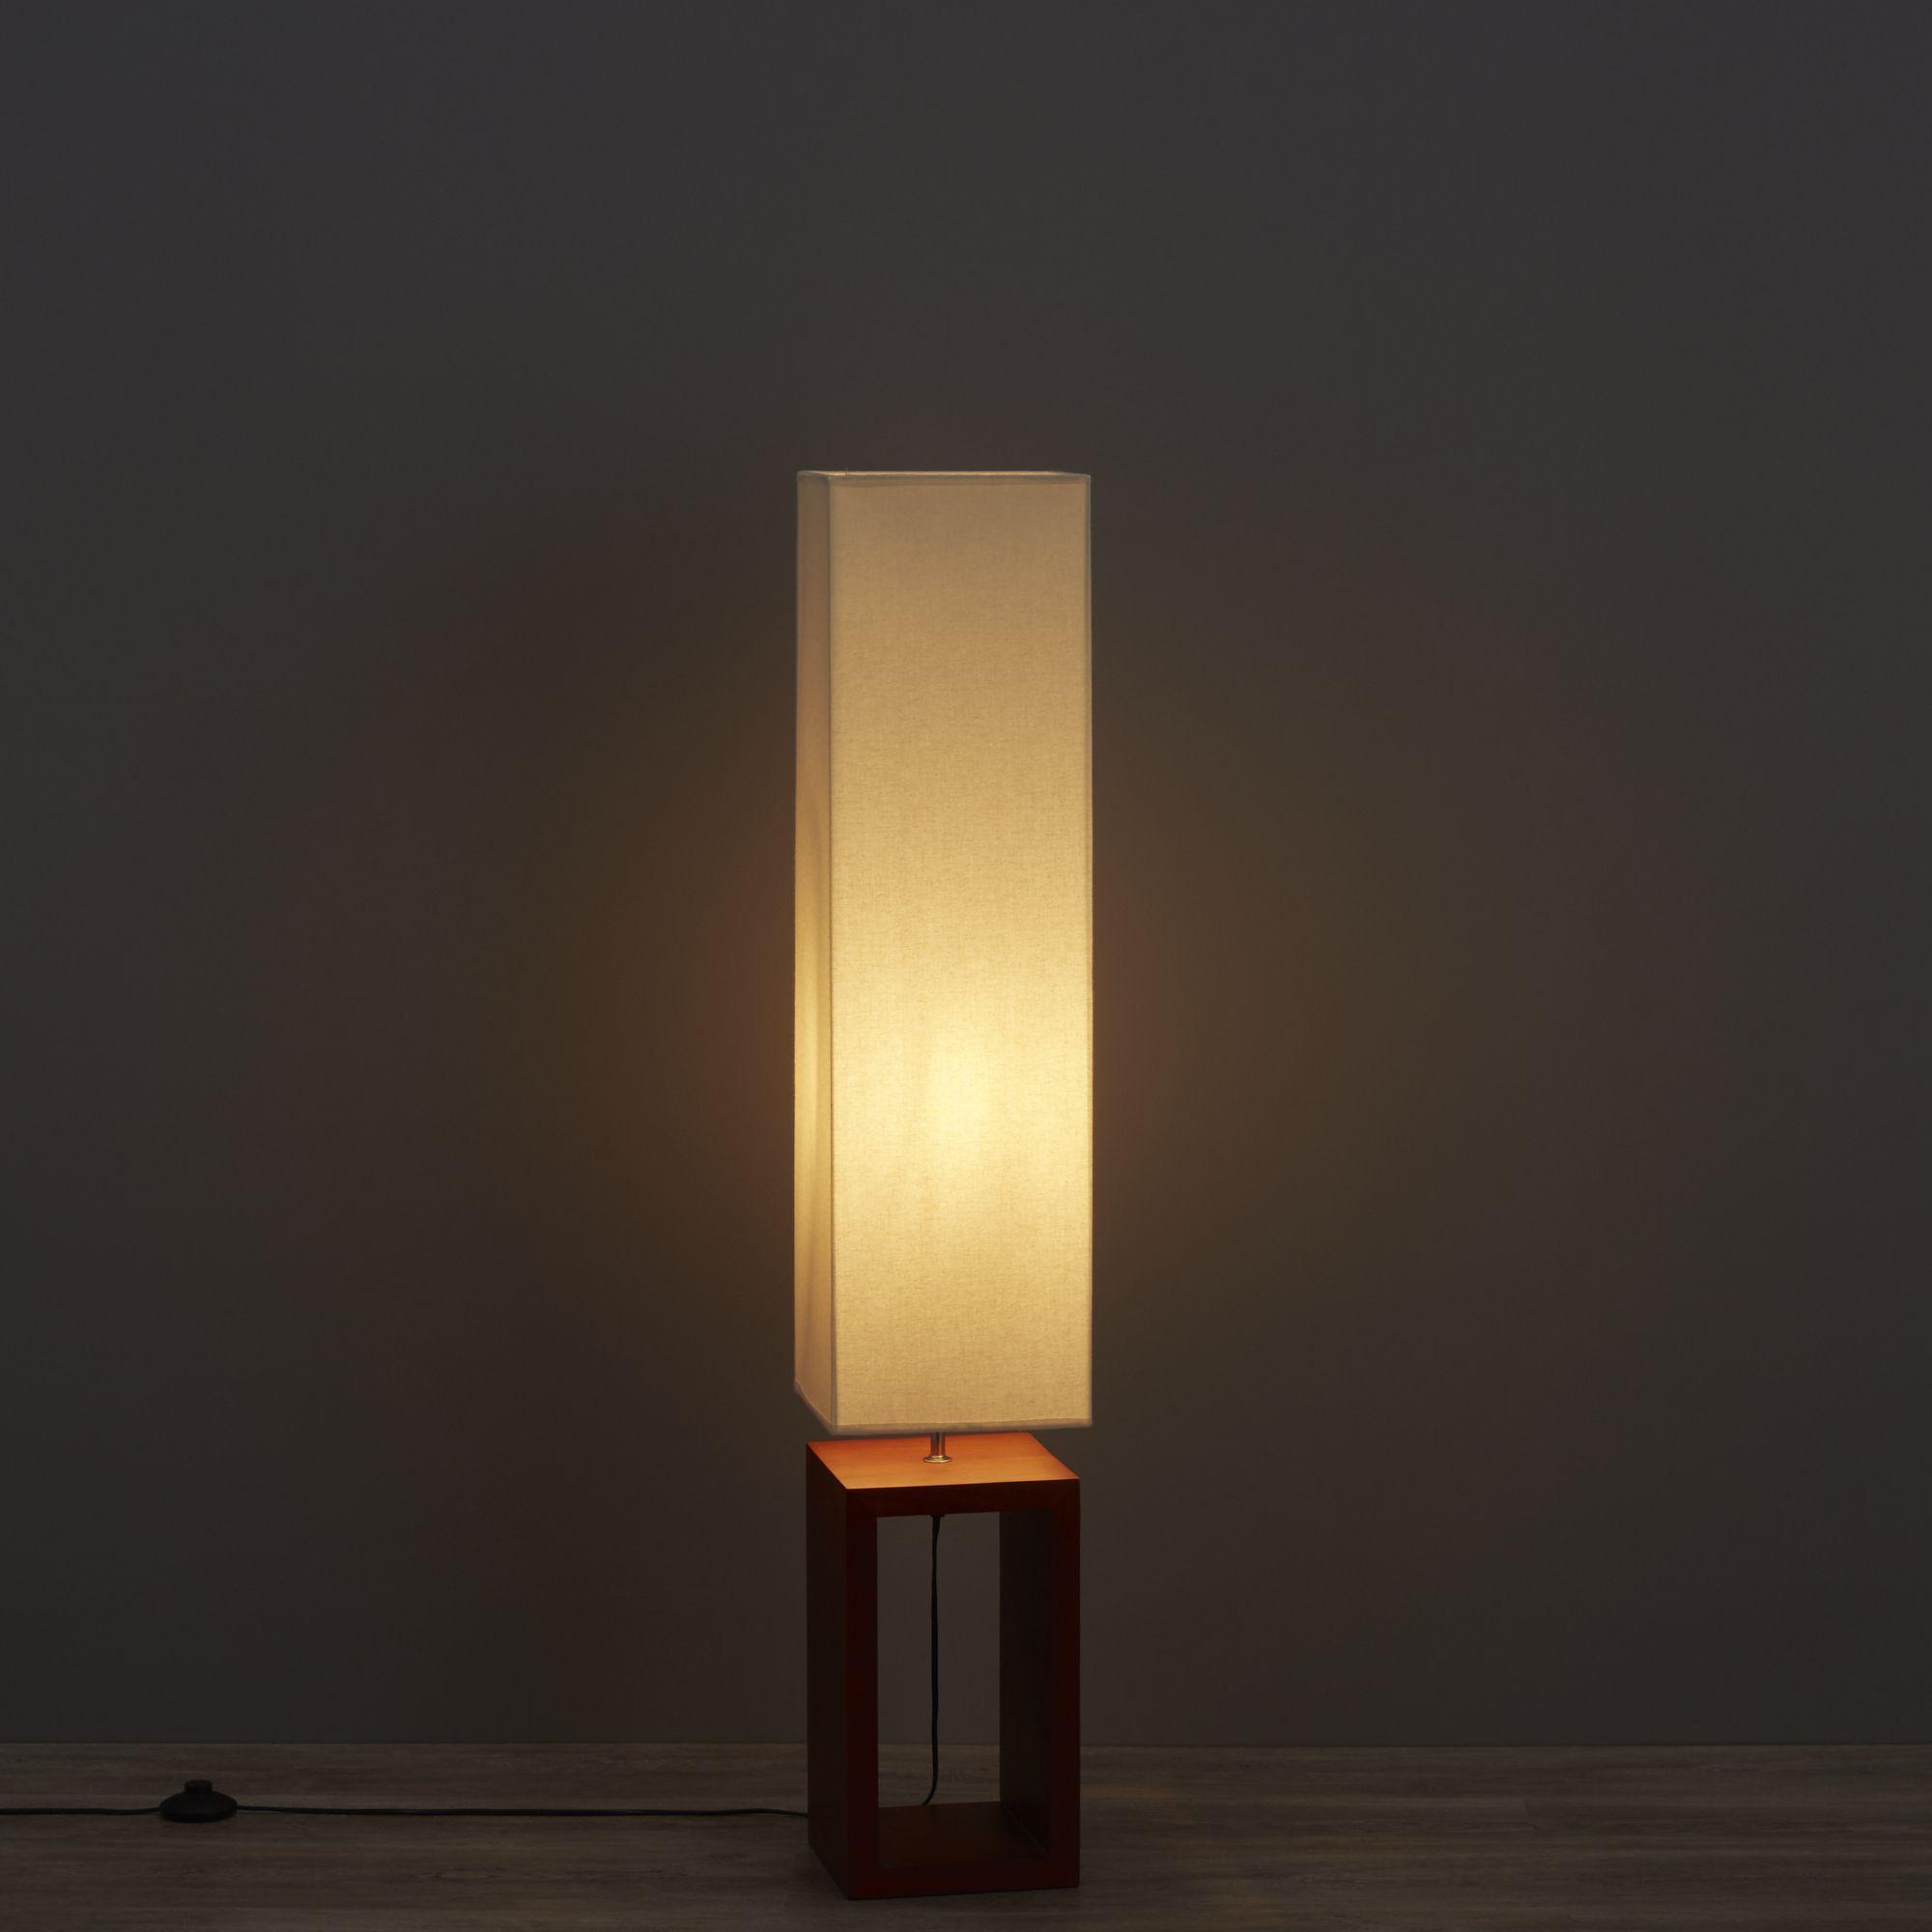 Diy at bq cargo dark brown cream floor lamp aloadofball Choice Image